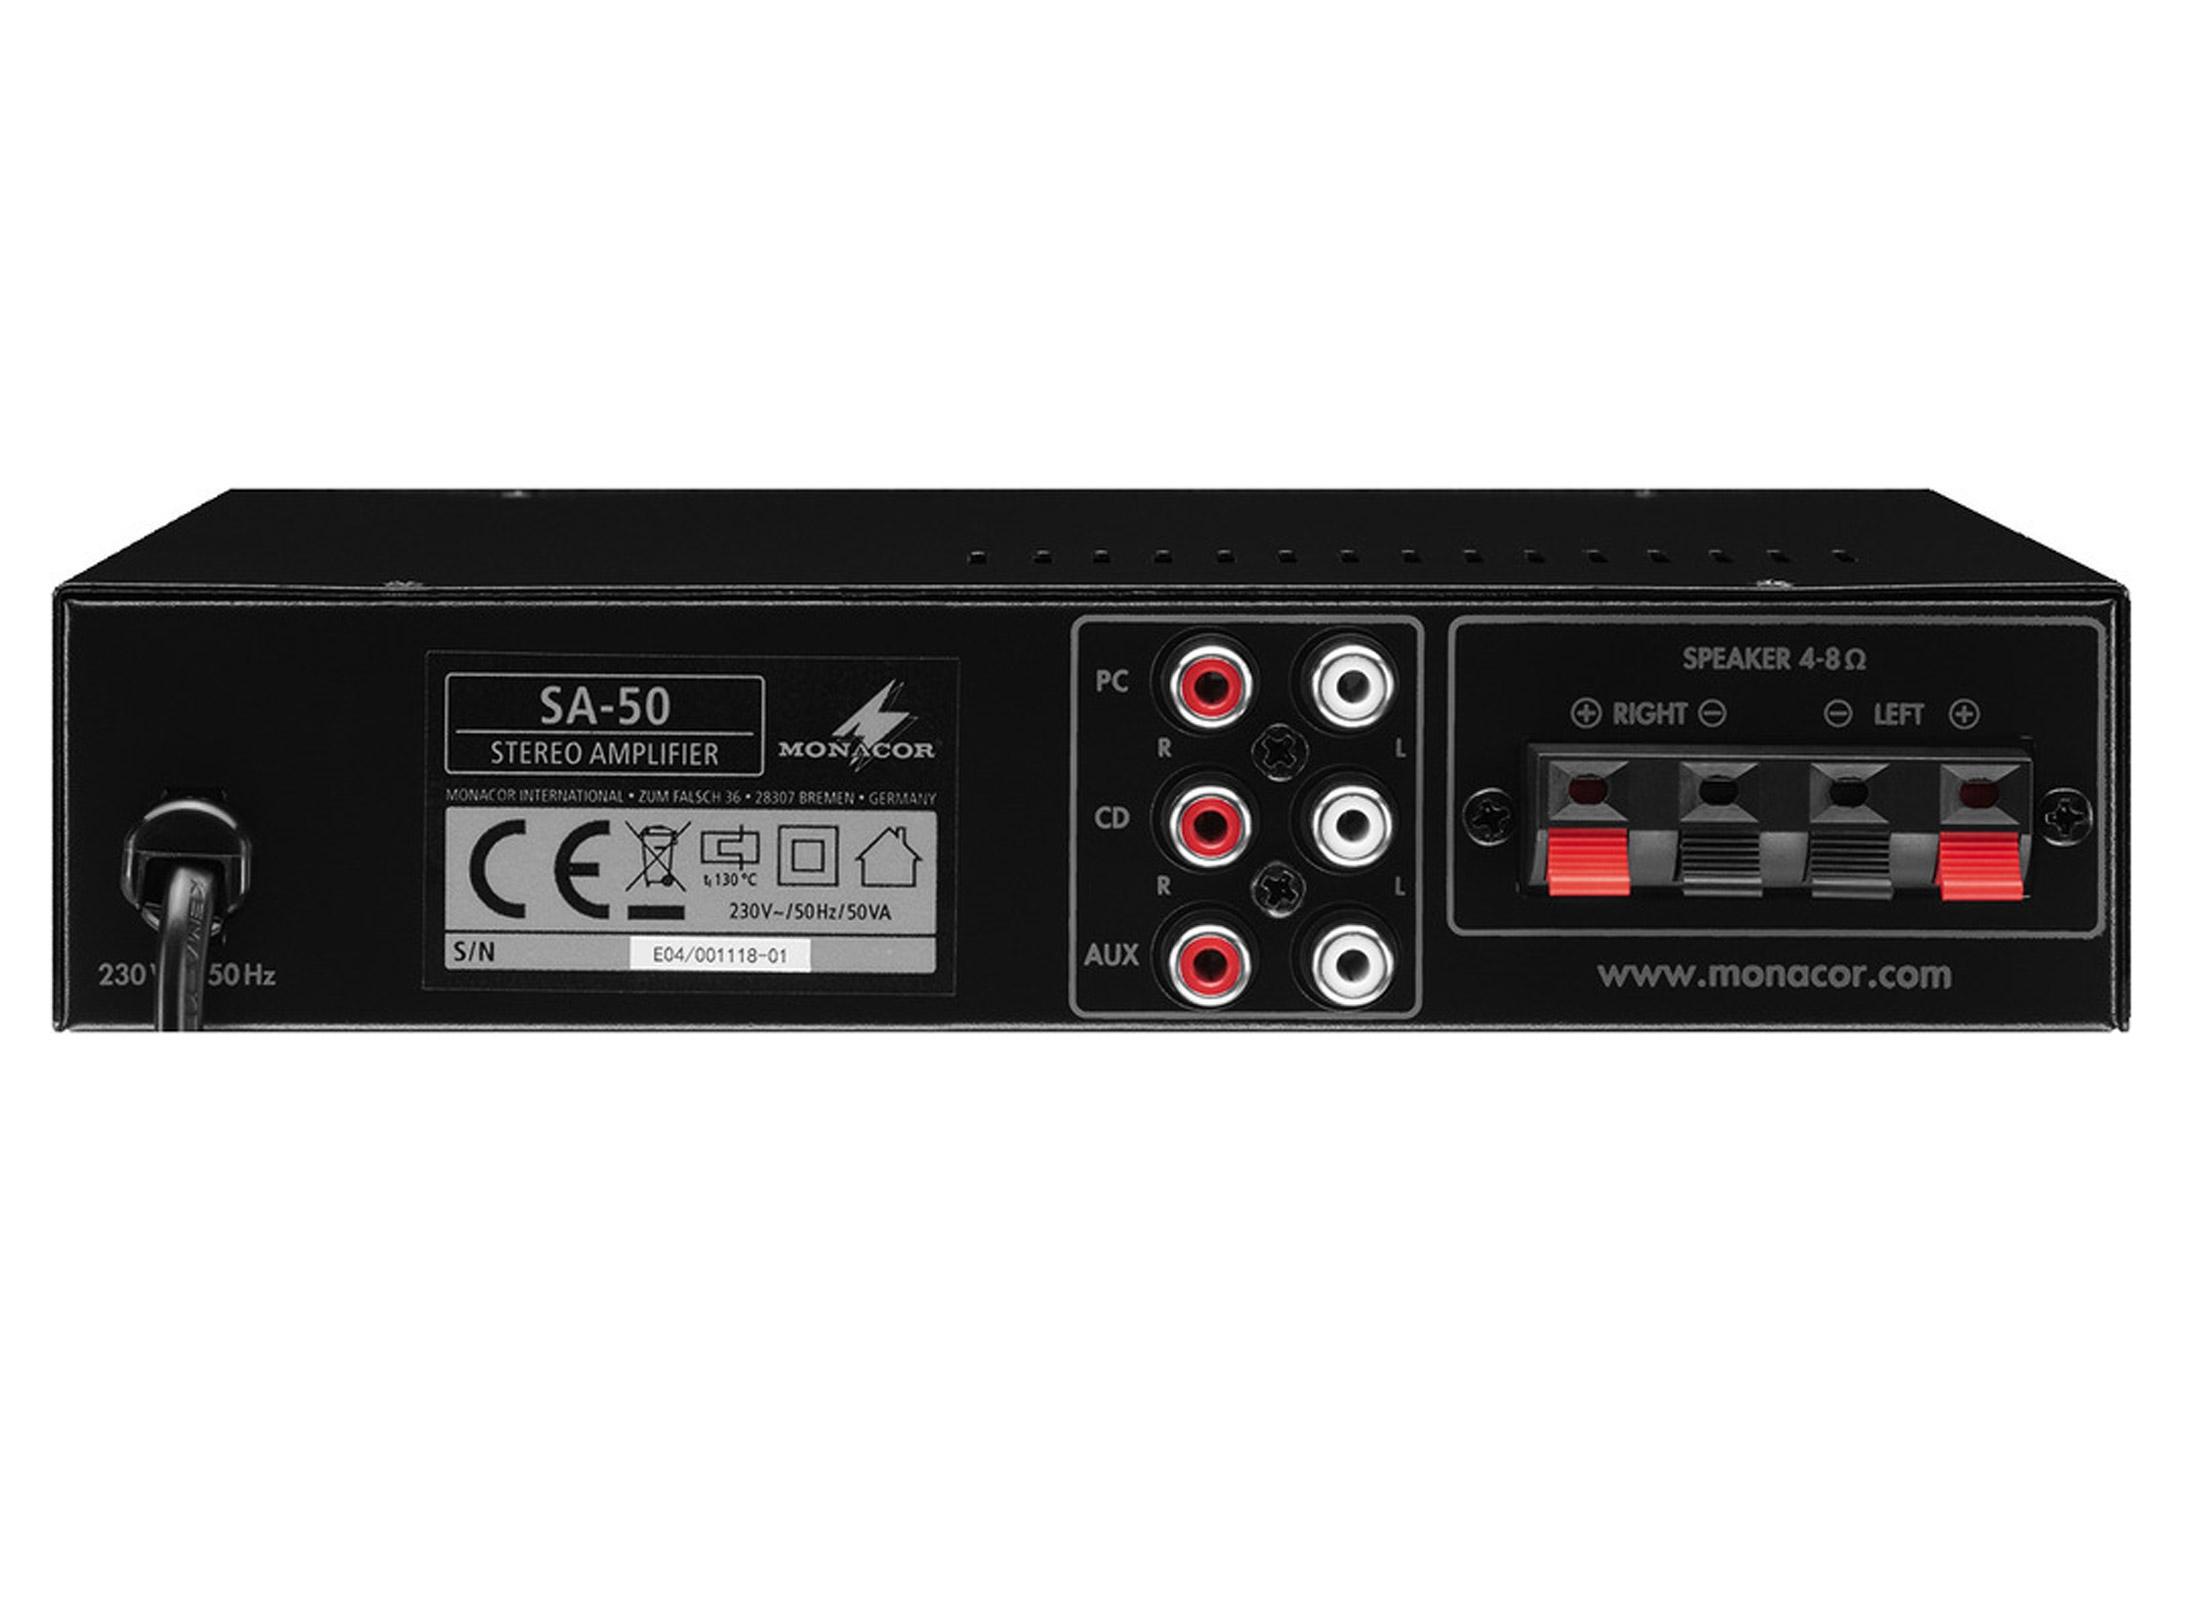 Monacor SA-50 Compact Amp , 2x 12 5W/4Ohms, 2x 10W/8Ohms, USB, Mini Jack  (Player), IN: 3xCinch (PC,CD,AUX) OUT: Clamp